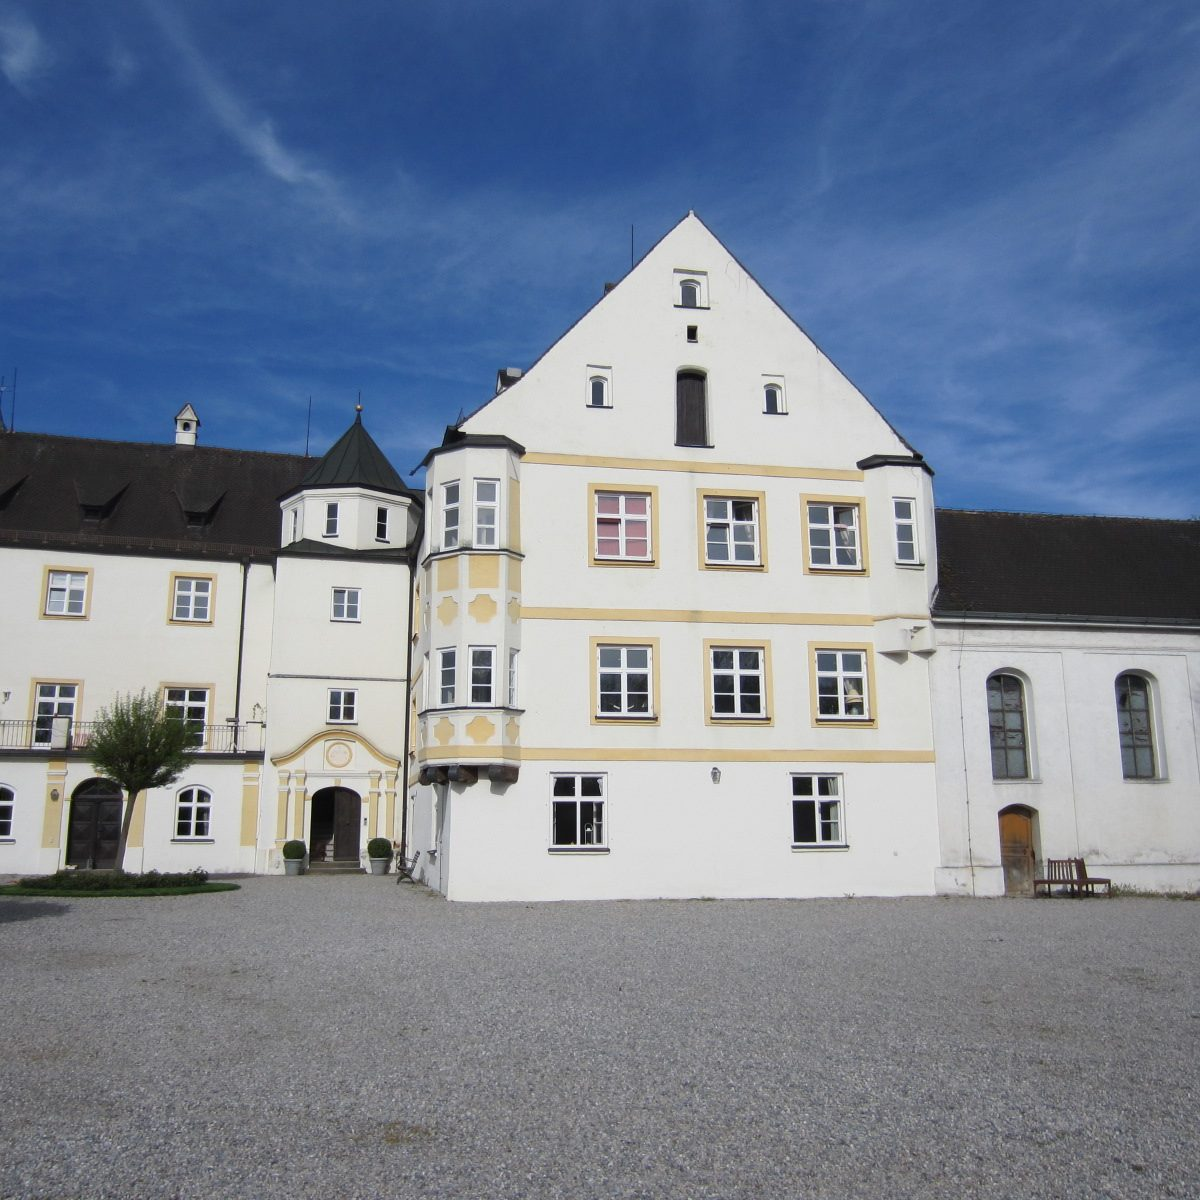 Biomass Heating at Castle Lauterbach - Energy consulting castle Lauterbach